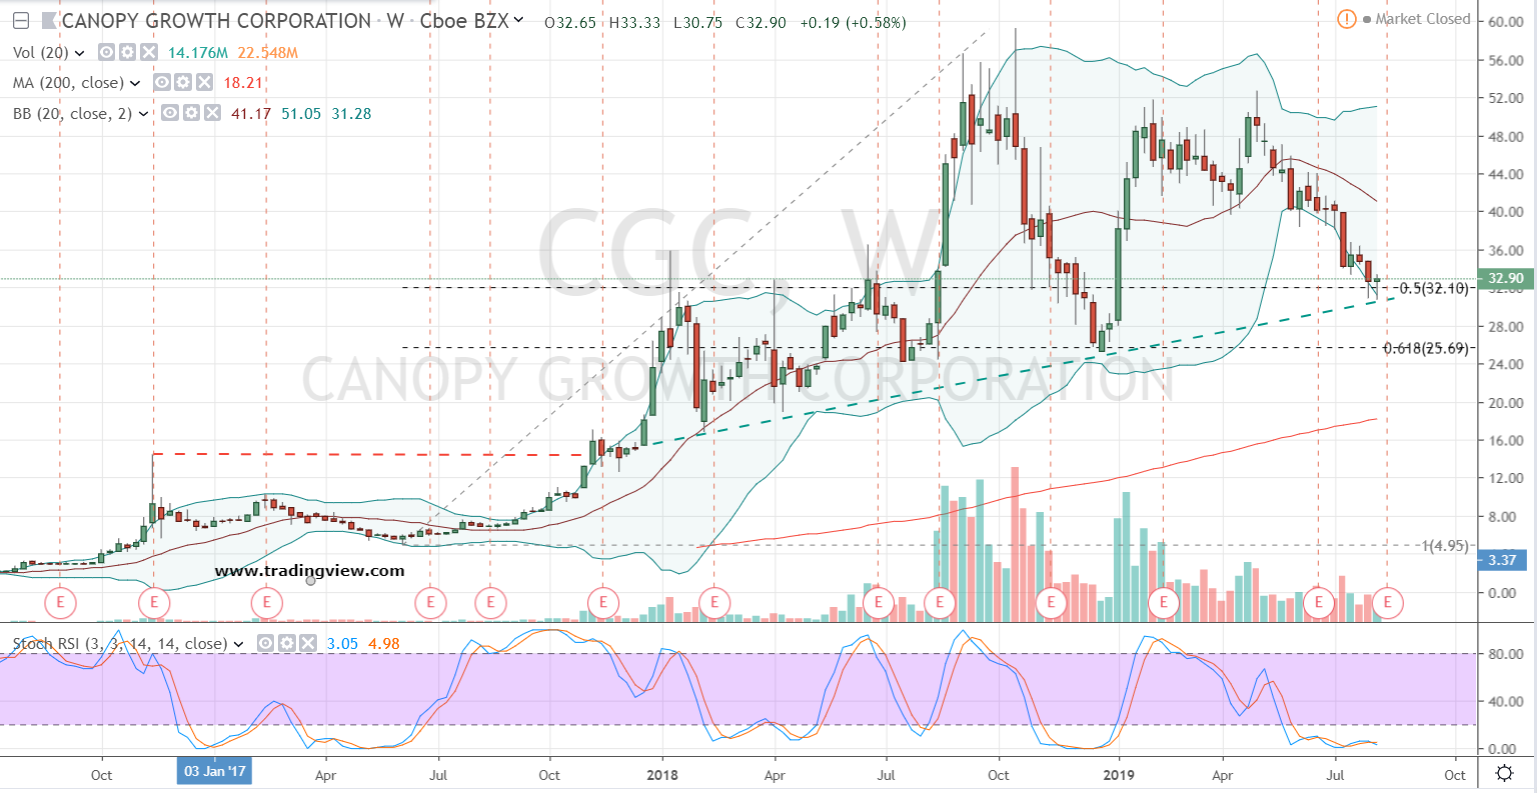 CGC Stock Weekly Chart